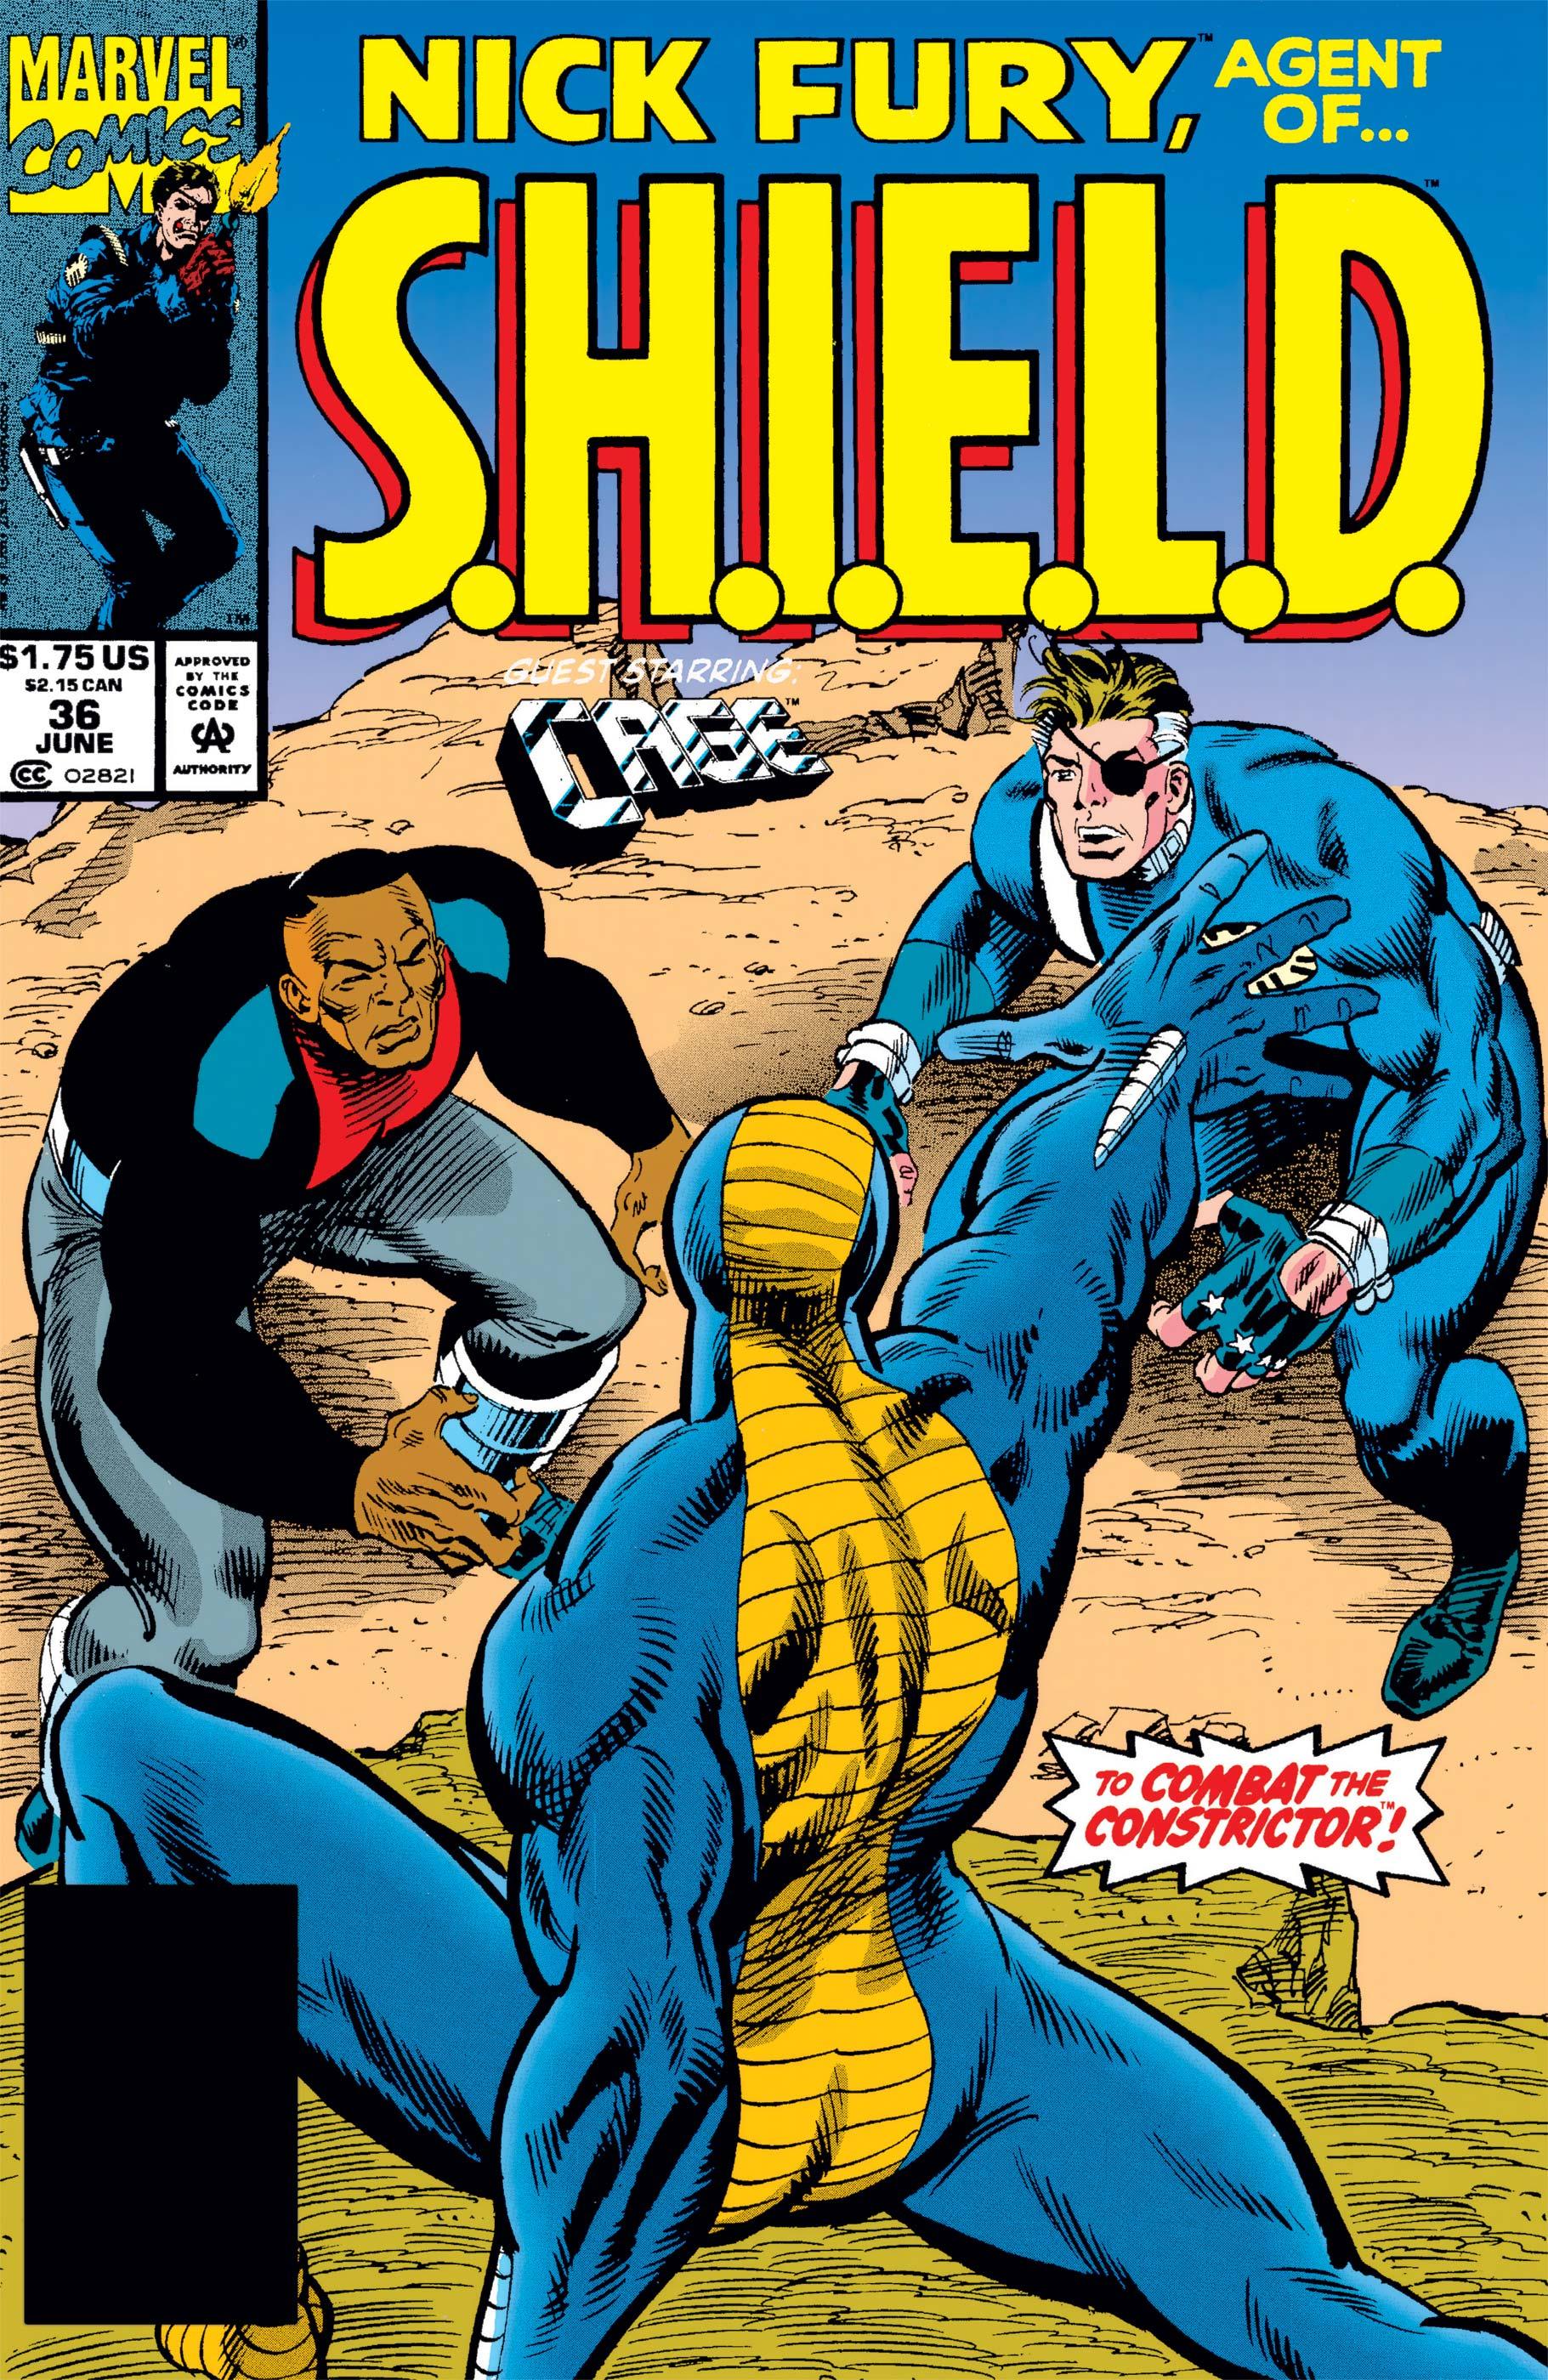 Nick Fury, Agent of S.H.I.E.L.D. (1989) #36